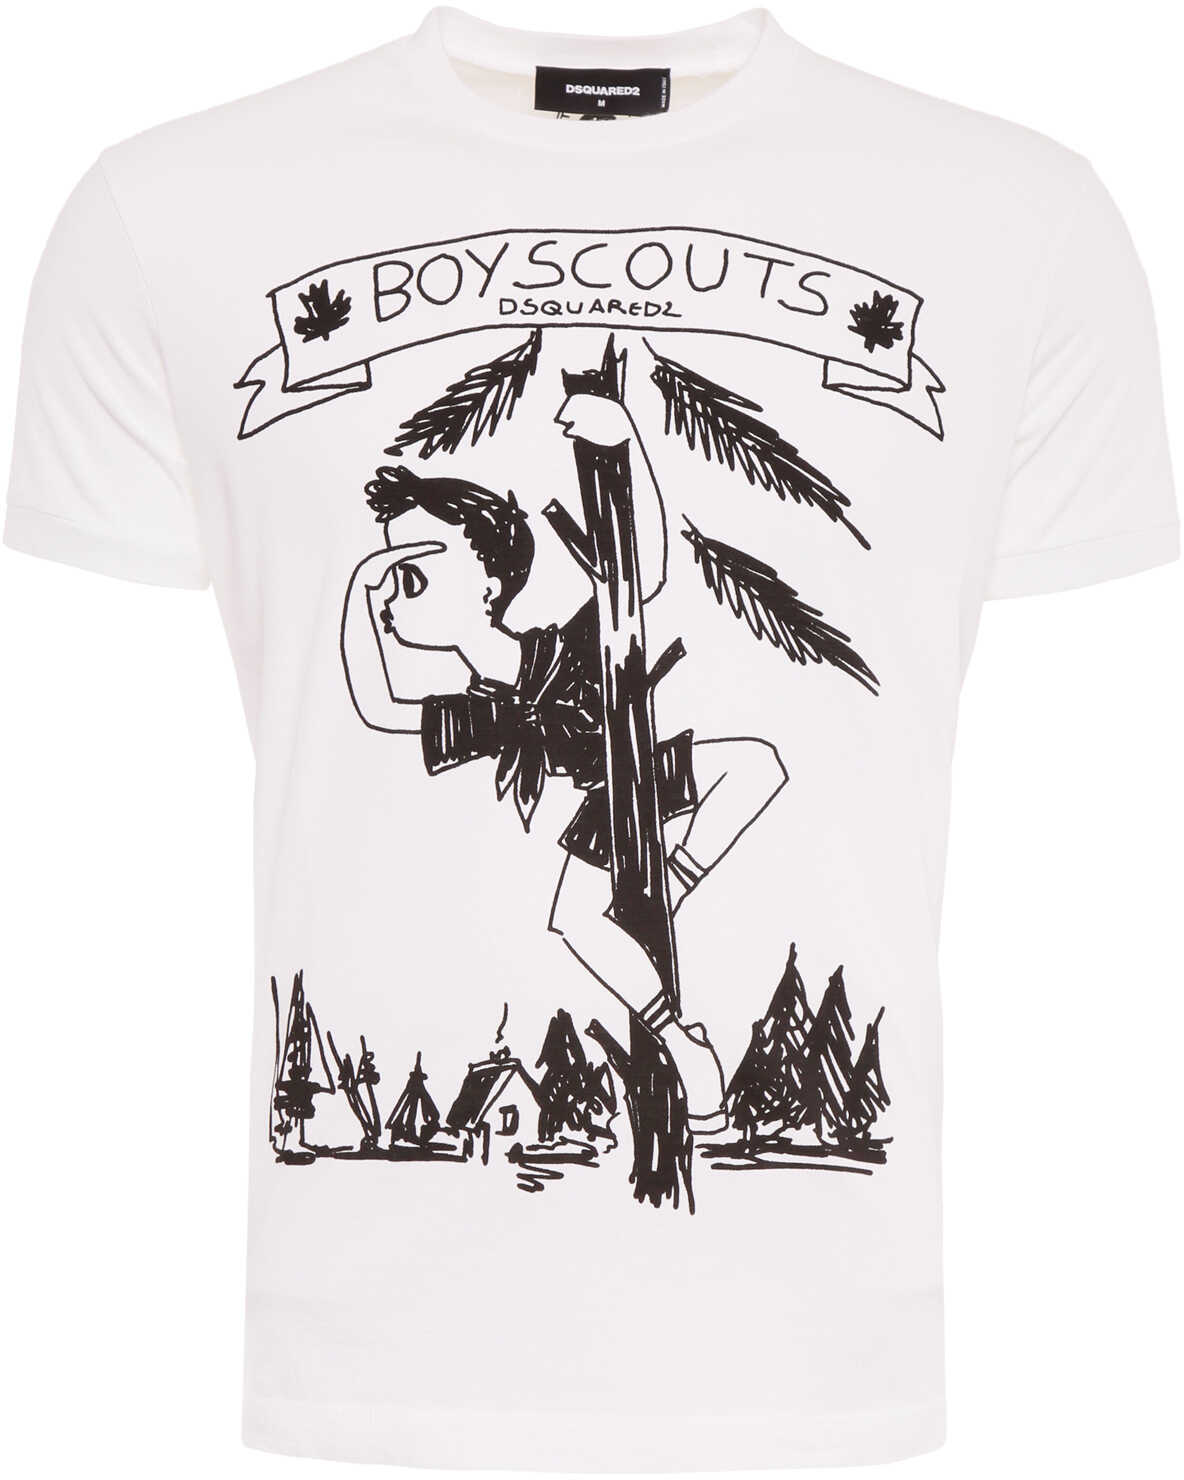 DSQUARED2 Boy Scouts Print T-Shirt BIANCO